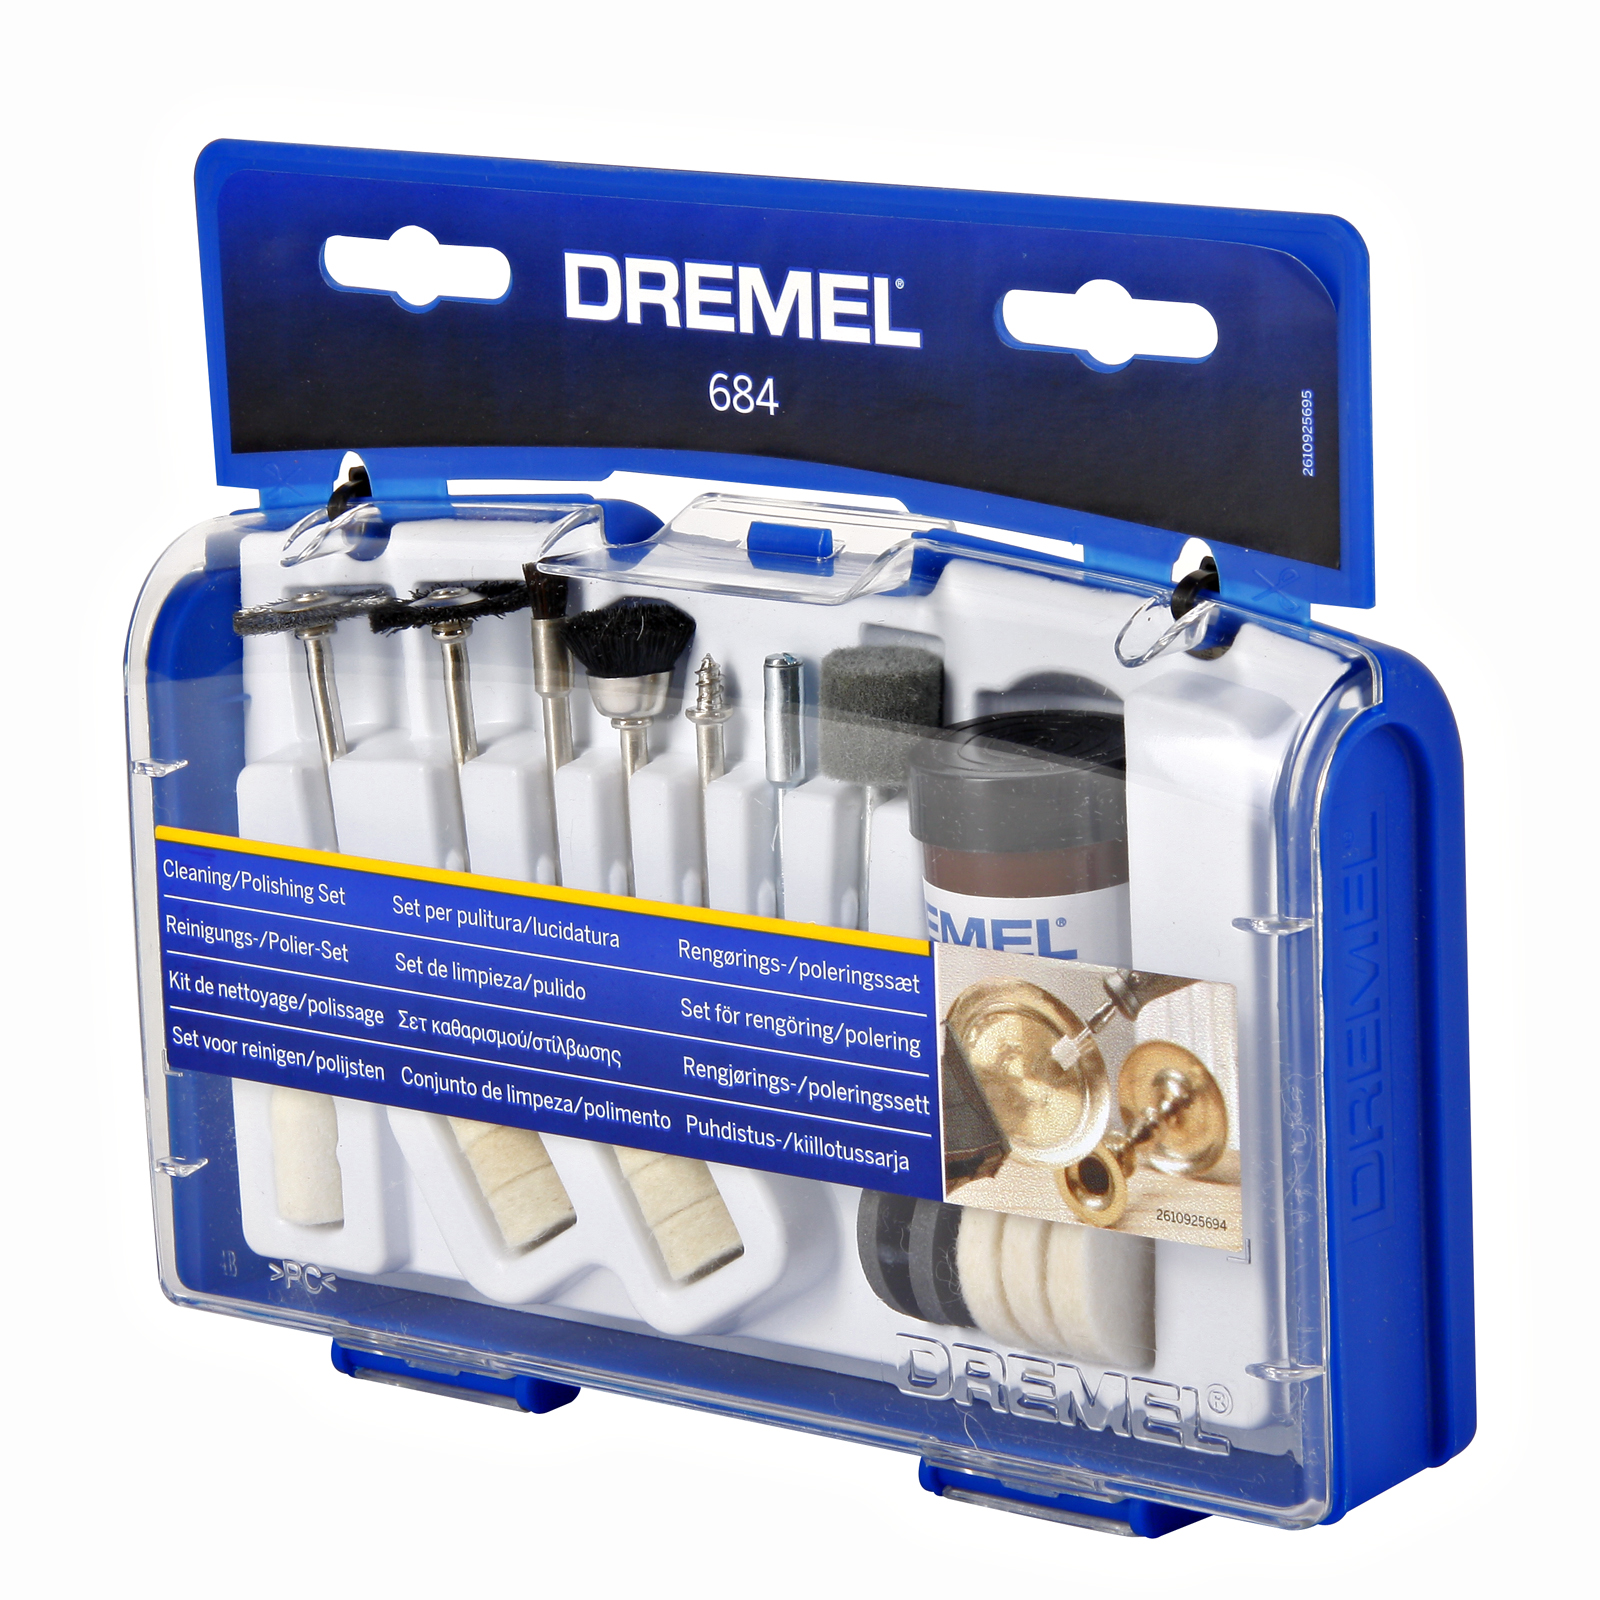 Набор насадок для дрели Dremel 684 набор для домашнего декора dremel f013g290jd